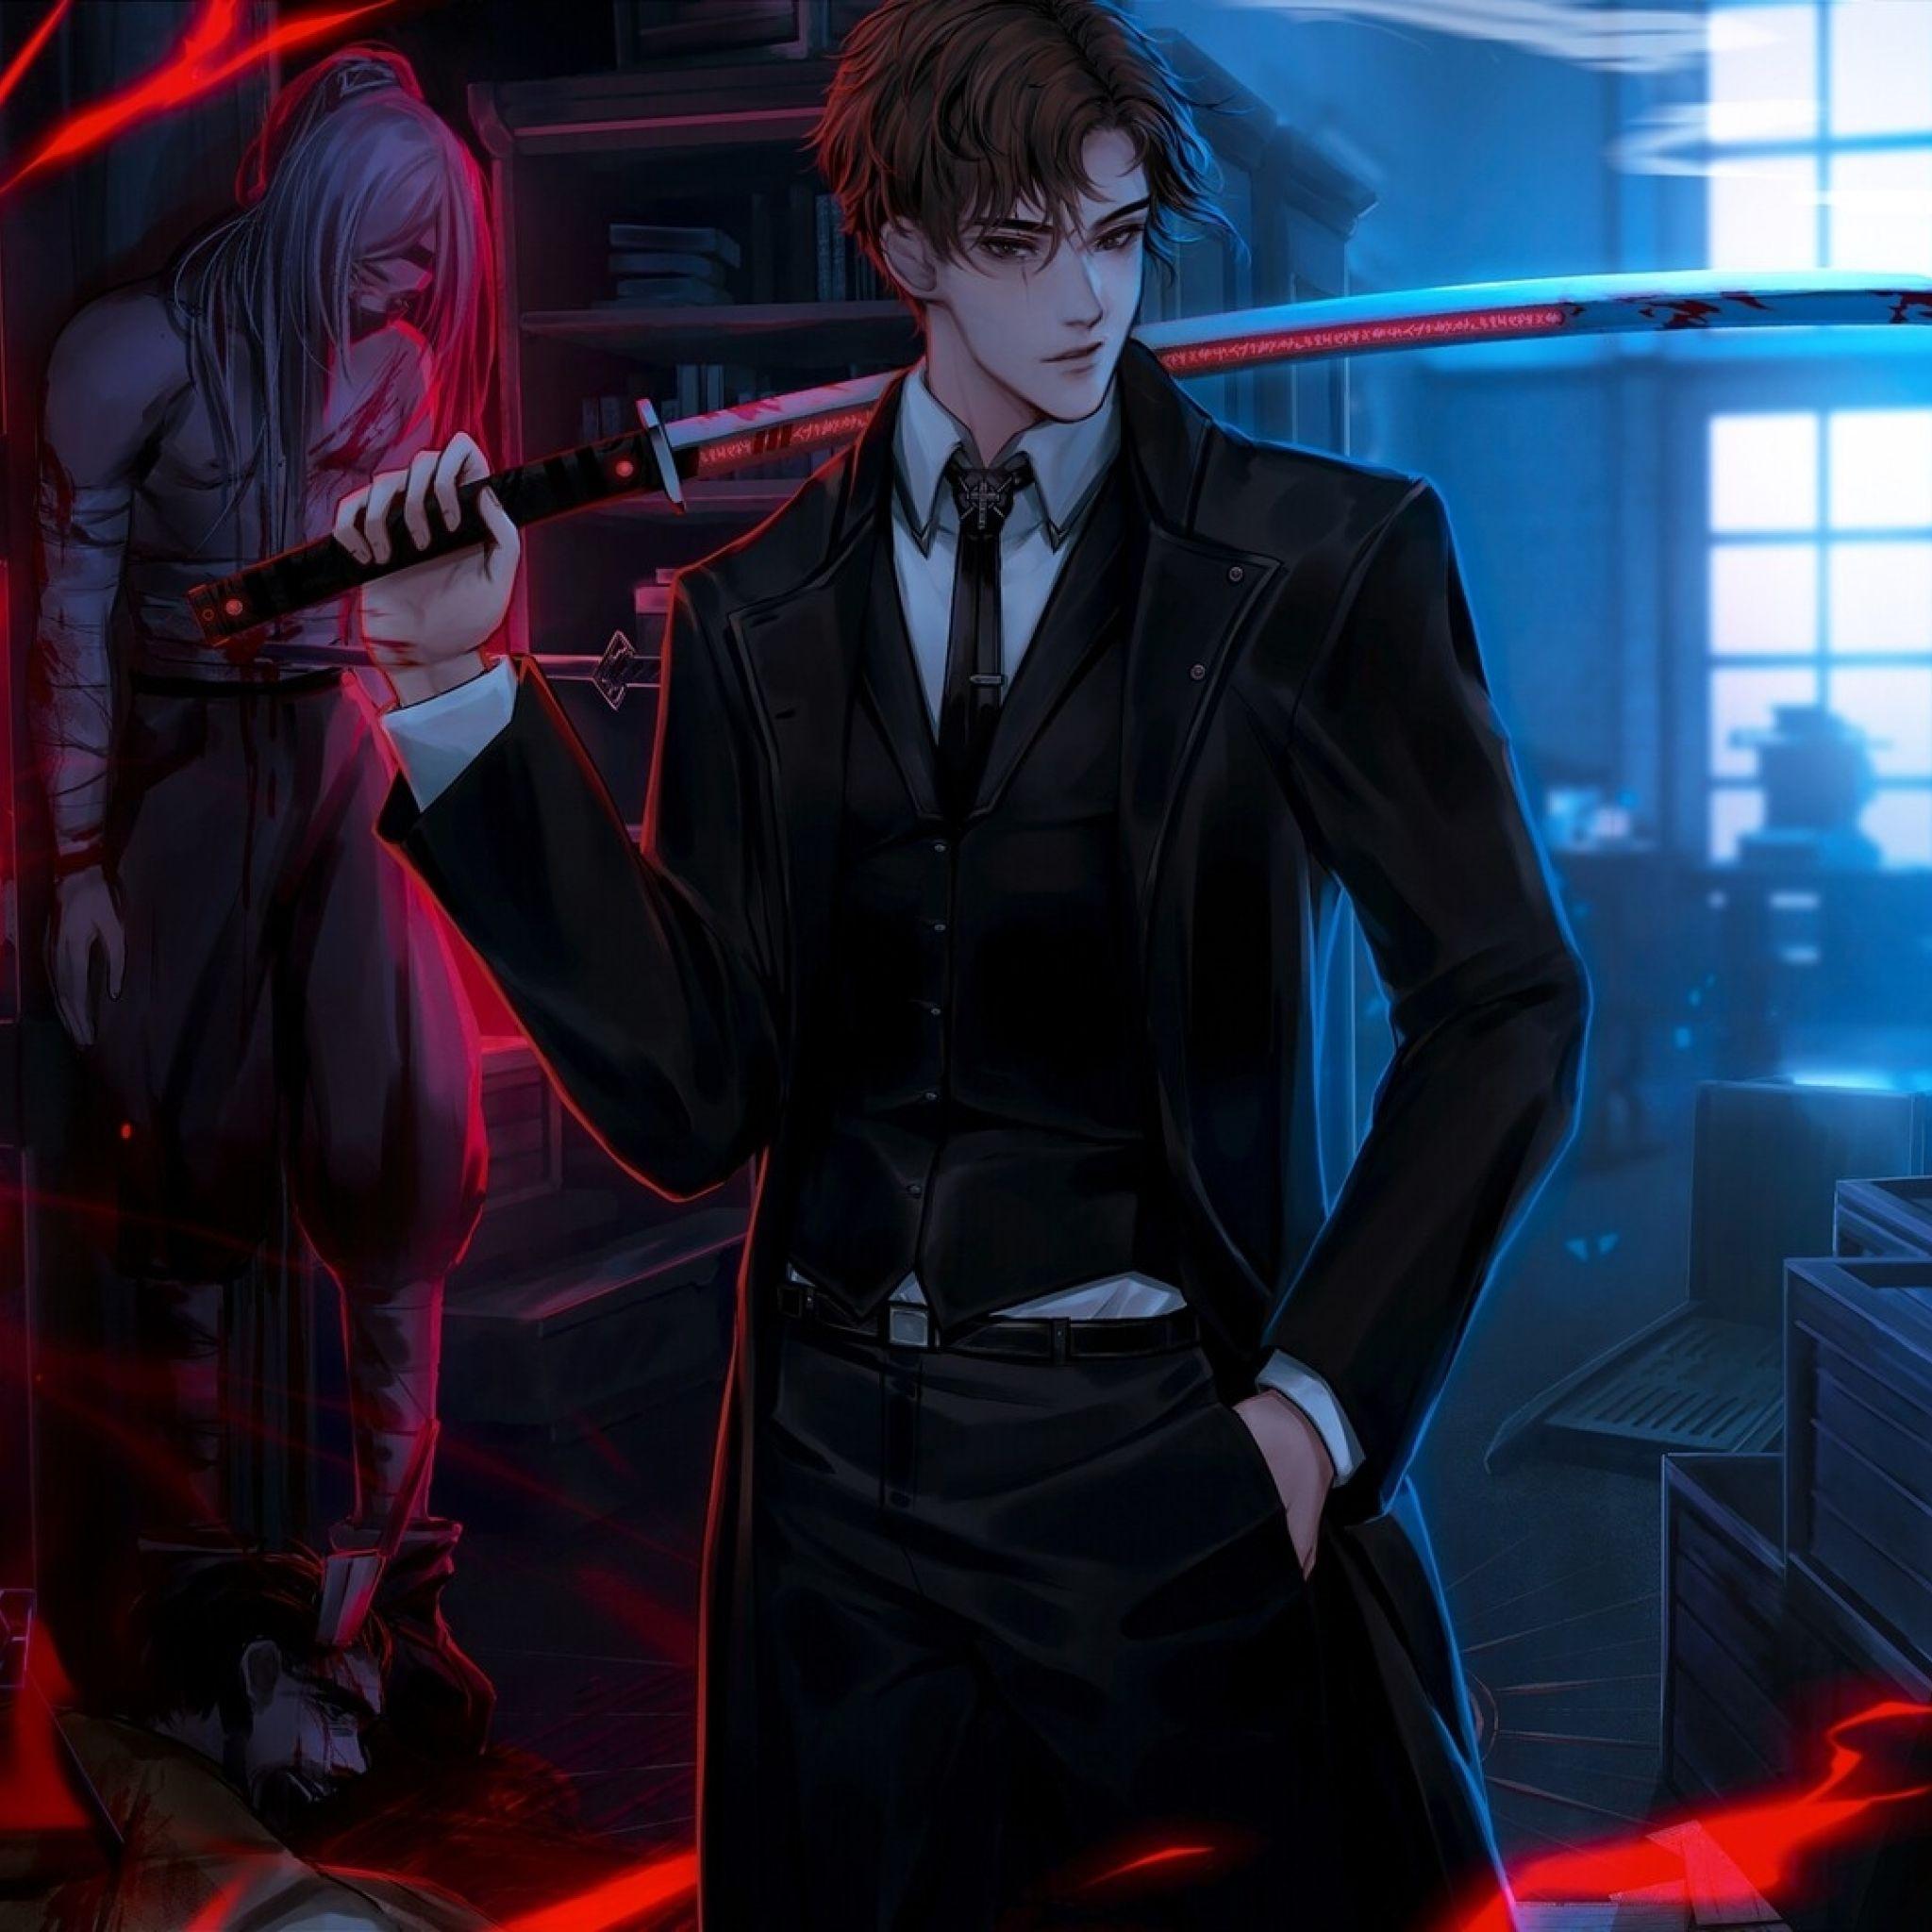 Anime Background Wallpaper Ipad